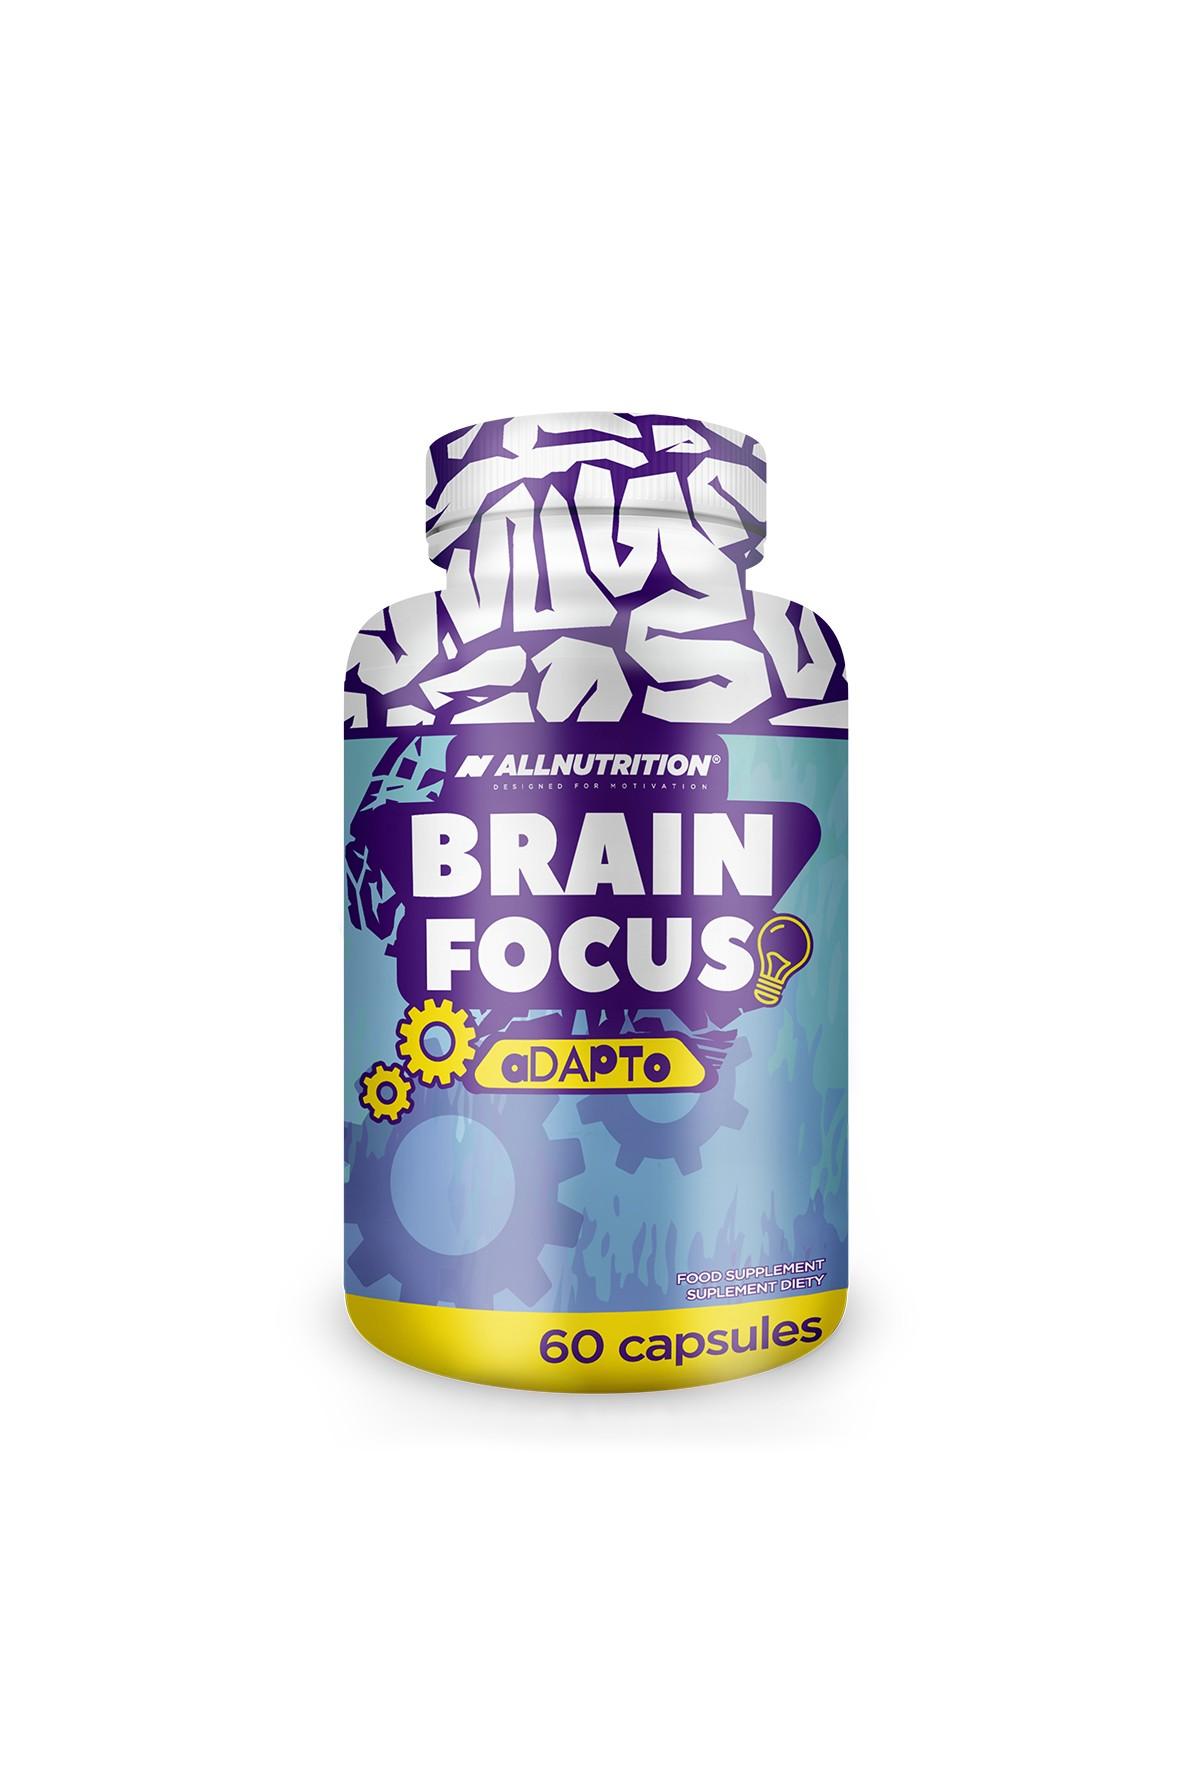 Suplementy diety - Allnutrition  Brain Focus - 60 kapsułek